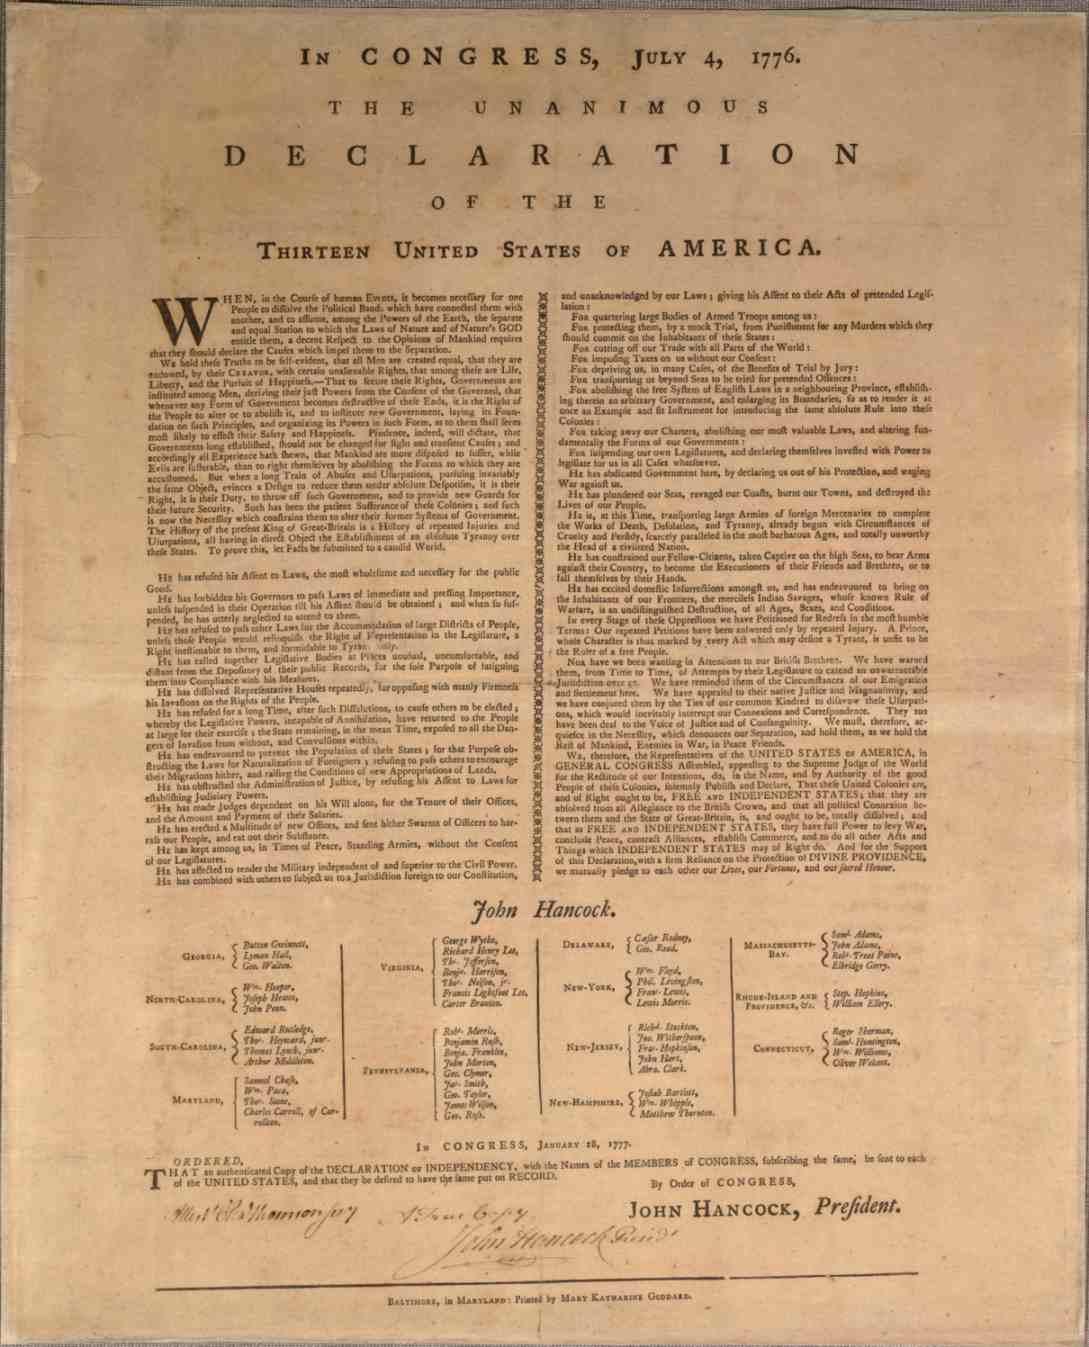 Mary Katherine Goddard Declaration of Independence